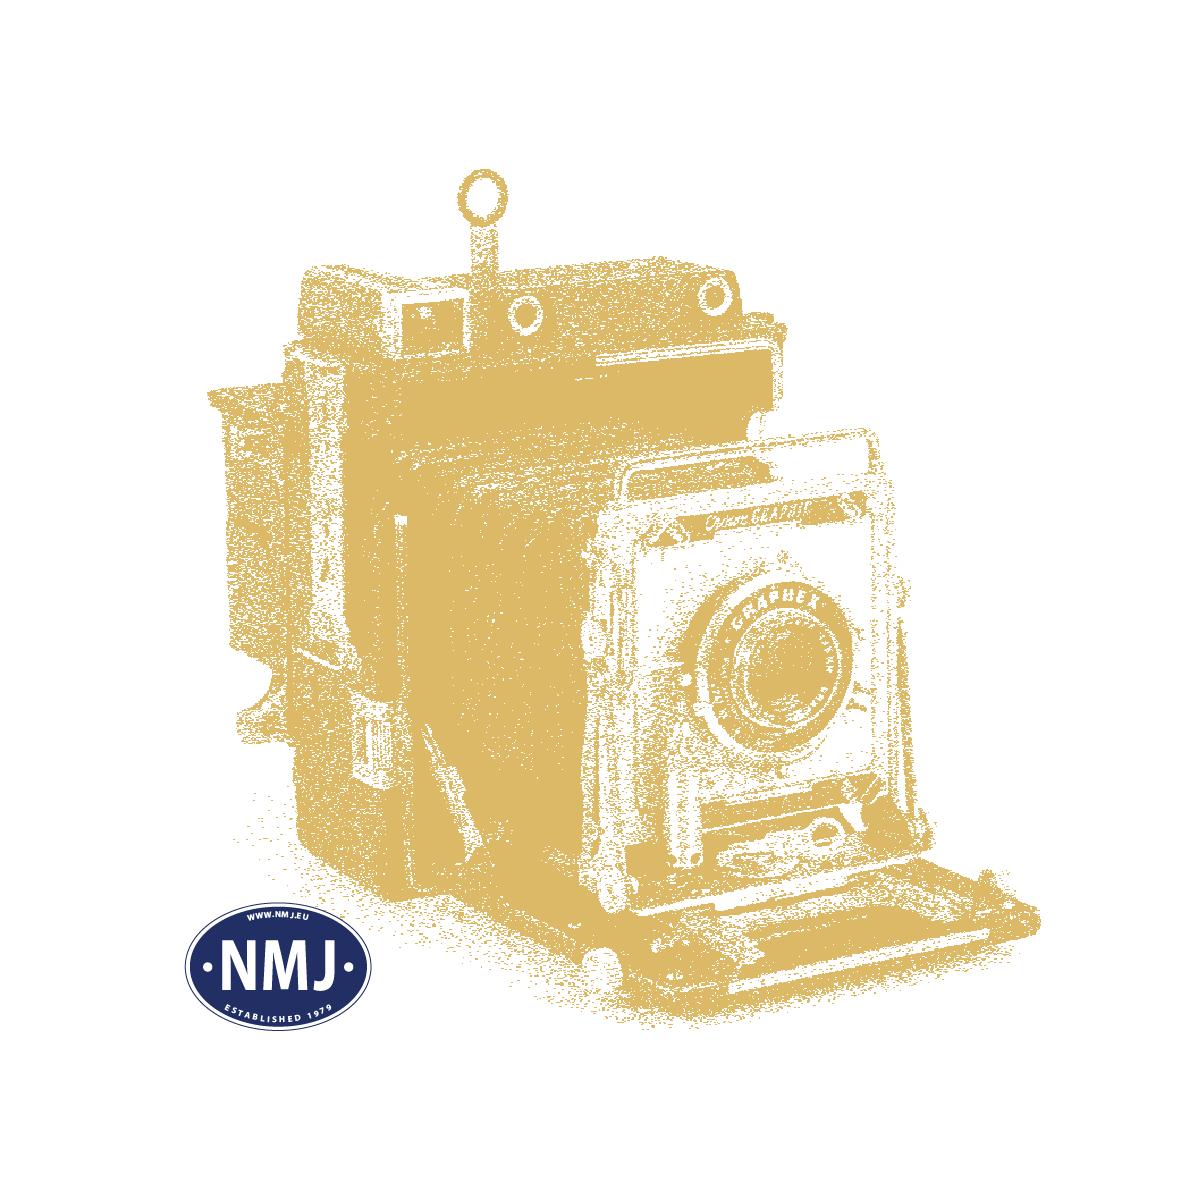 NMJT107.101 - NMJ Topline NSB B3-2 25572 Redbrown livery